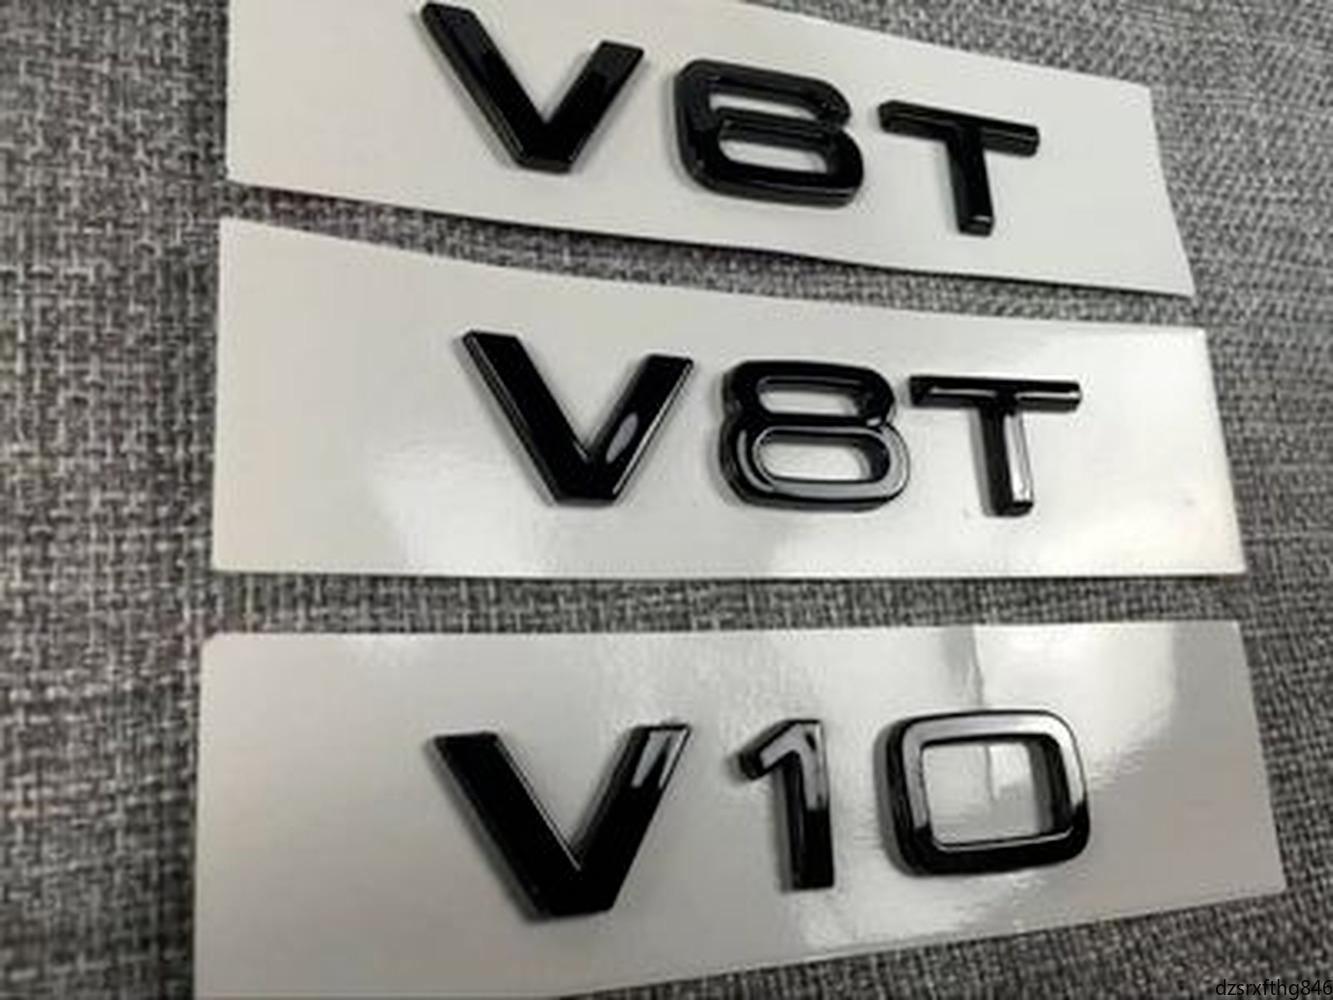 Car Styling ABS Glossy Black V6T V8T Vcc Side Body Emblem Tail Trunk Fender Badge Sticker For Audi A4 A3 A5 A6 A1 Q3 Q5 Q